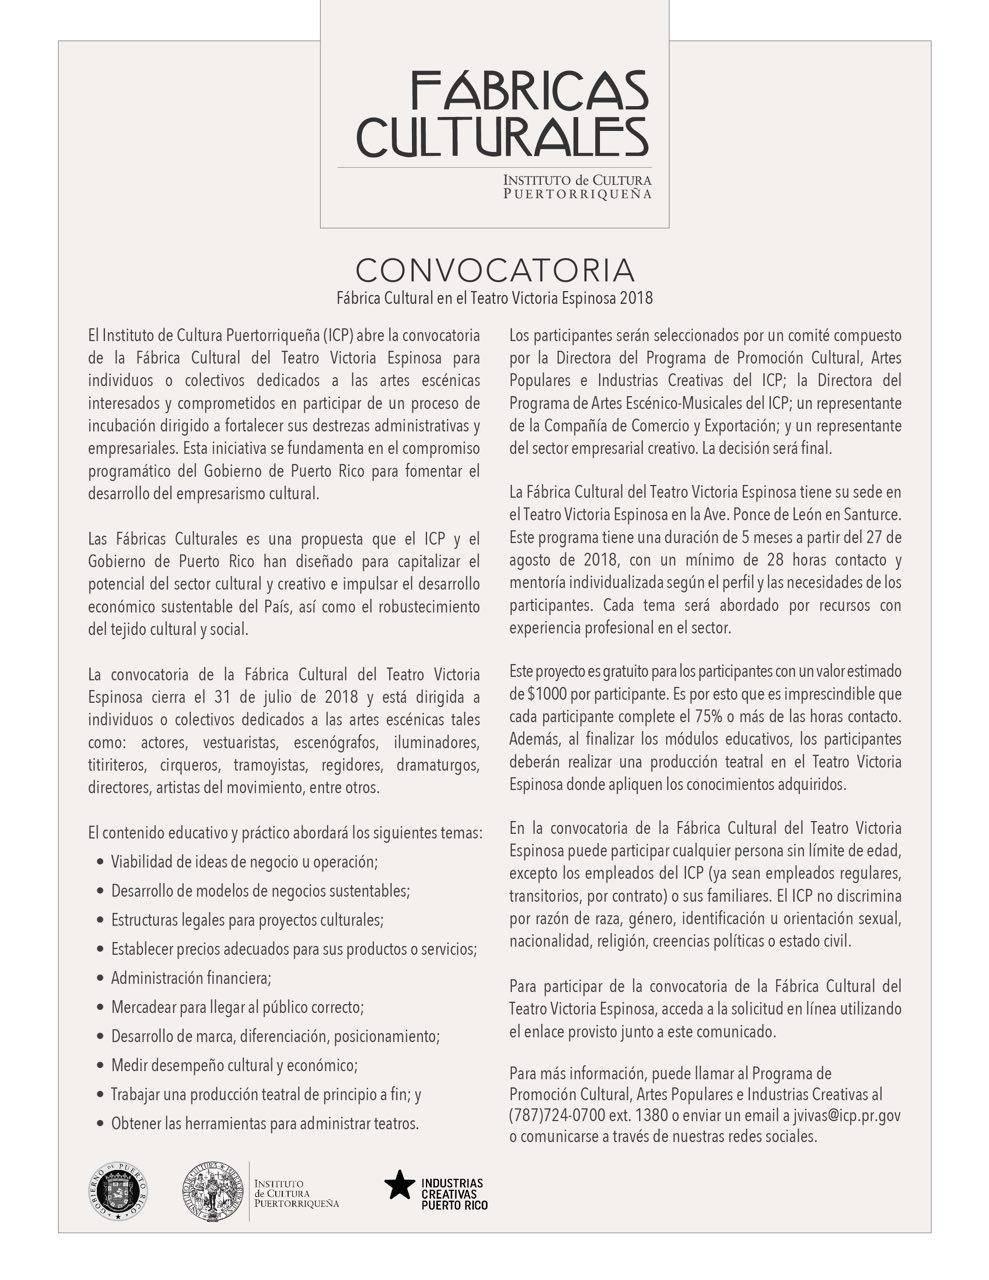 convocatoriaicp-d3057a2022c2247e1314aa52919d5962.jpg